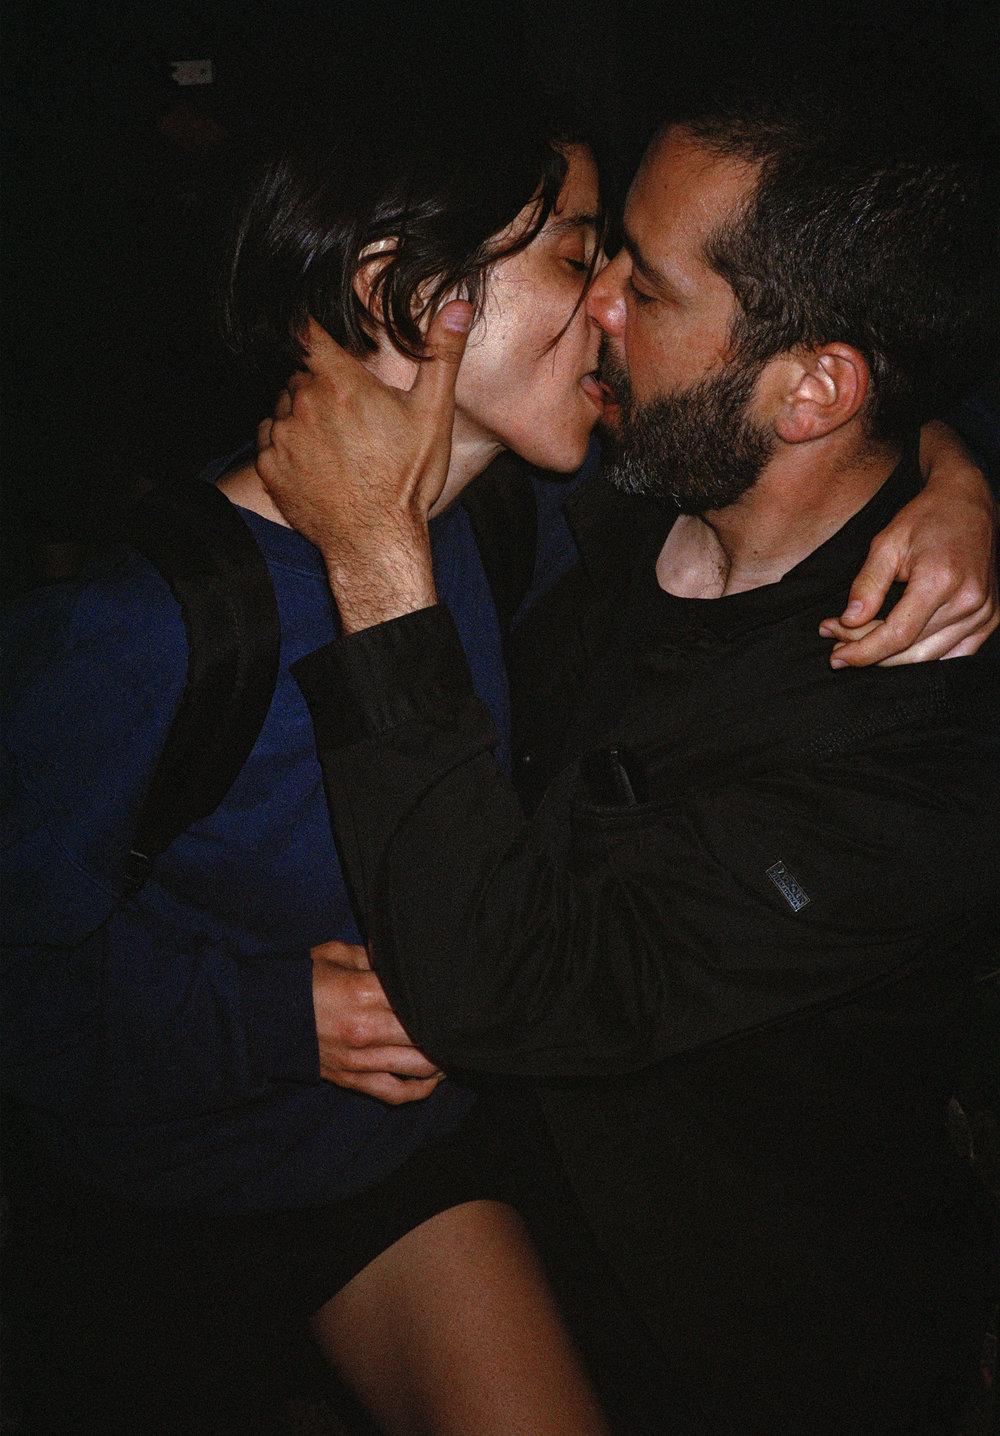 03. Carolina Pimenta - Suck & Blow - GUS & ISCA.jpg